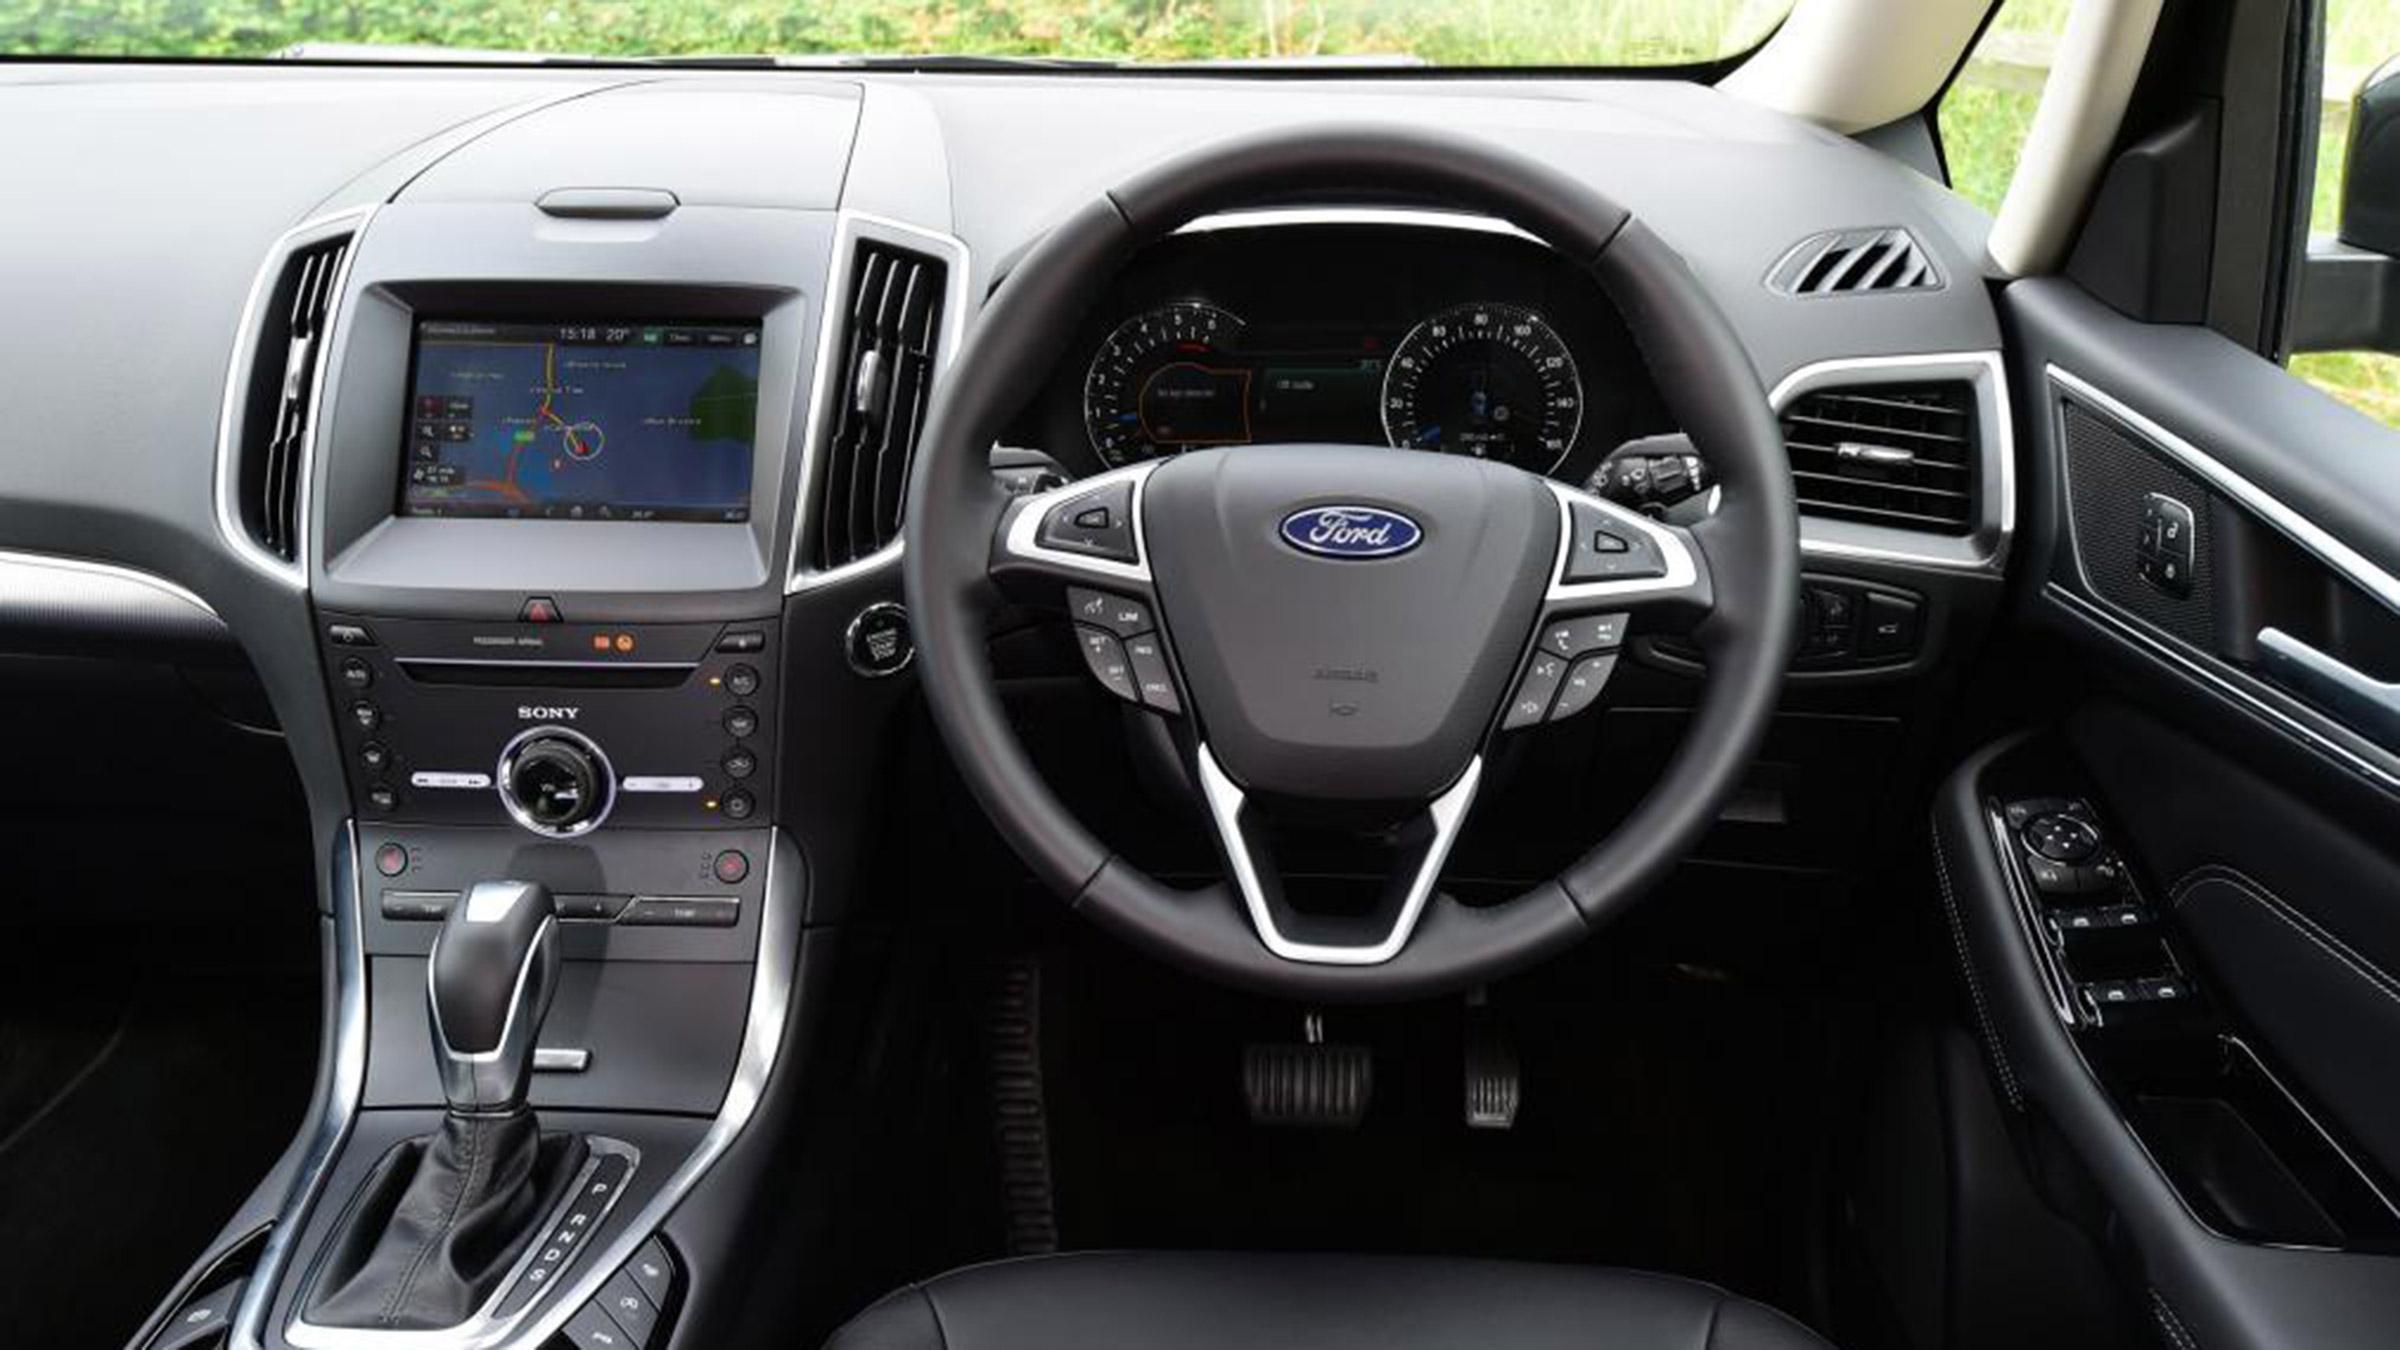 Ford Galaxy Interior Satnav Dashboard Options Auto Express